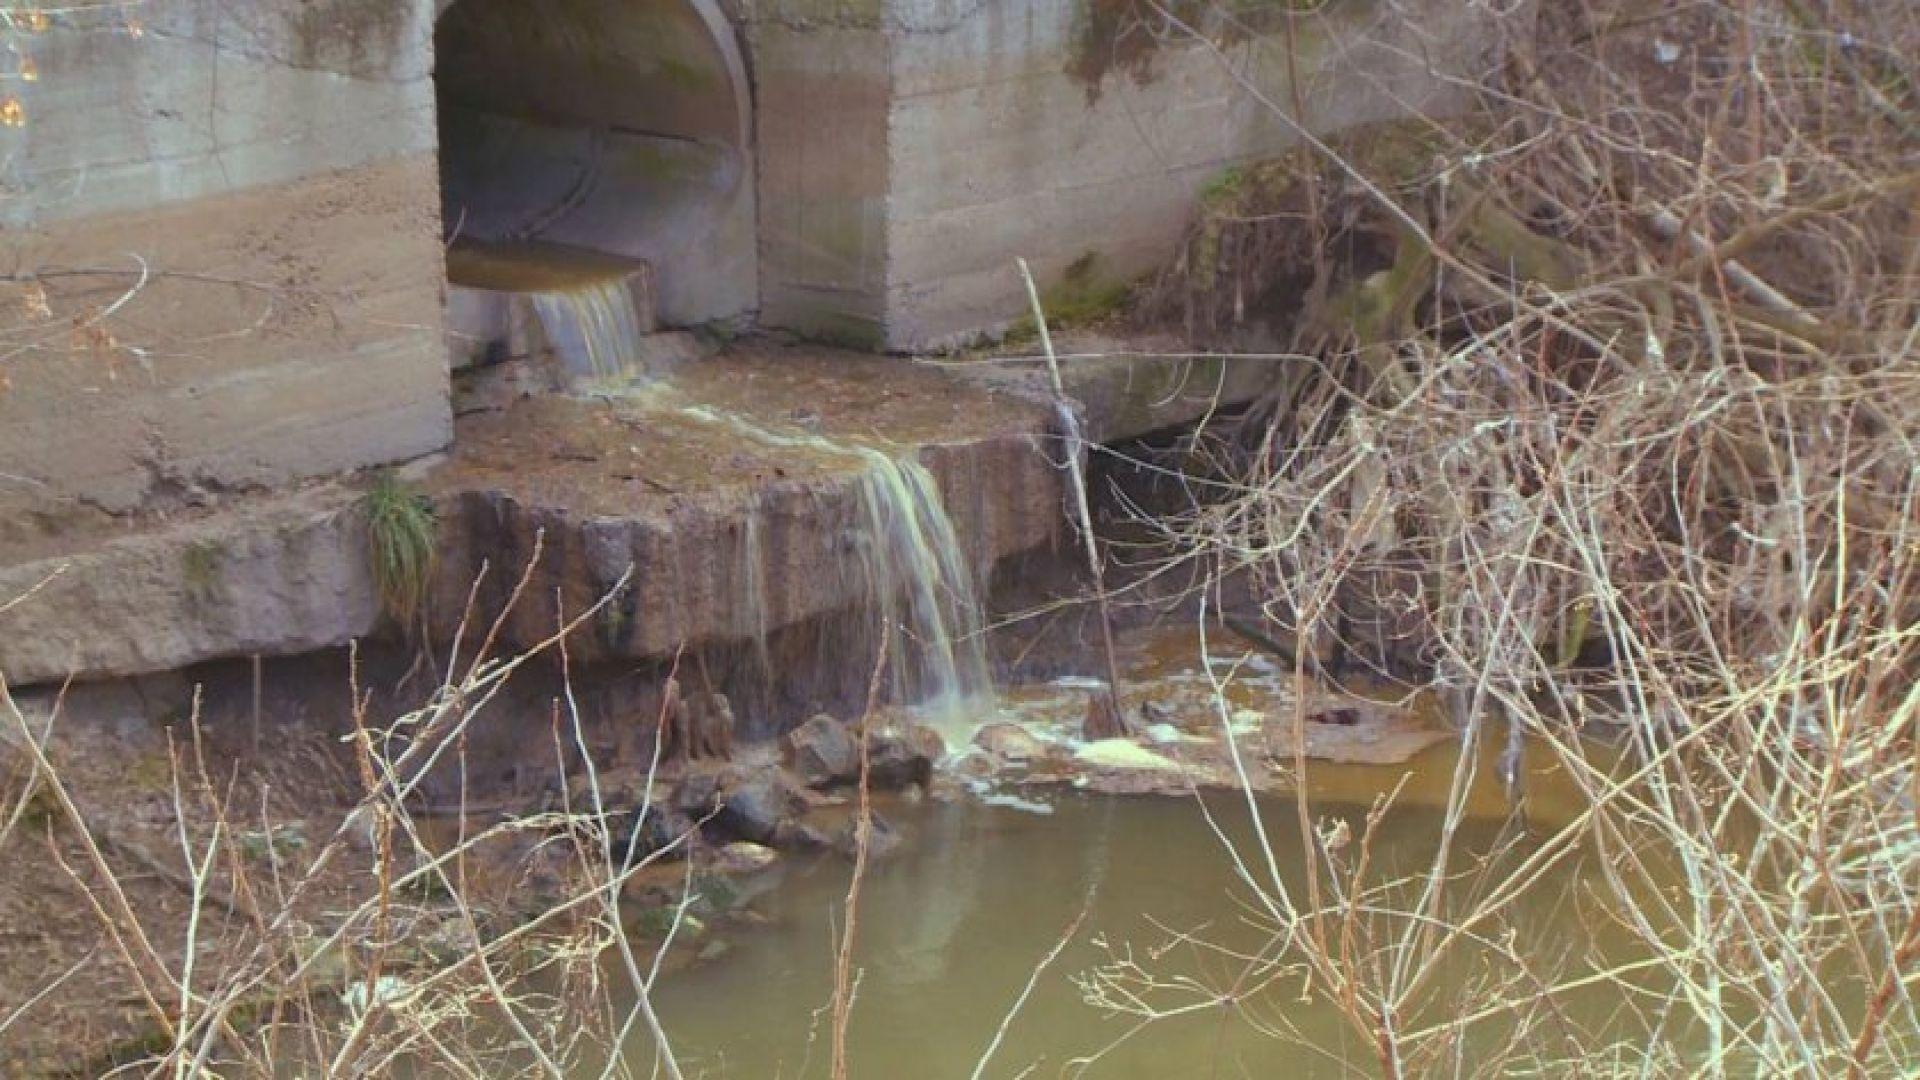 Русенска фирма замърсява водите на река Русенски Лом, която се